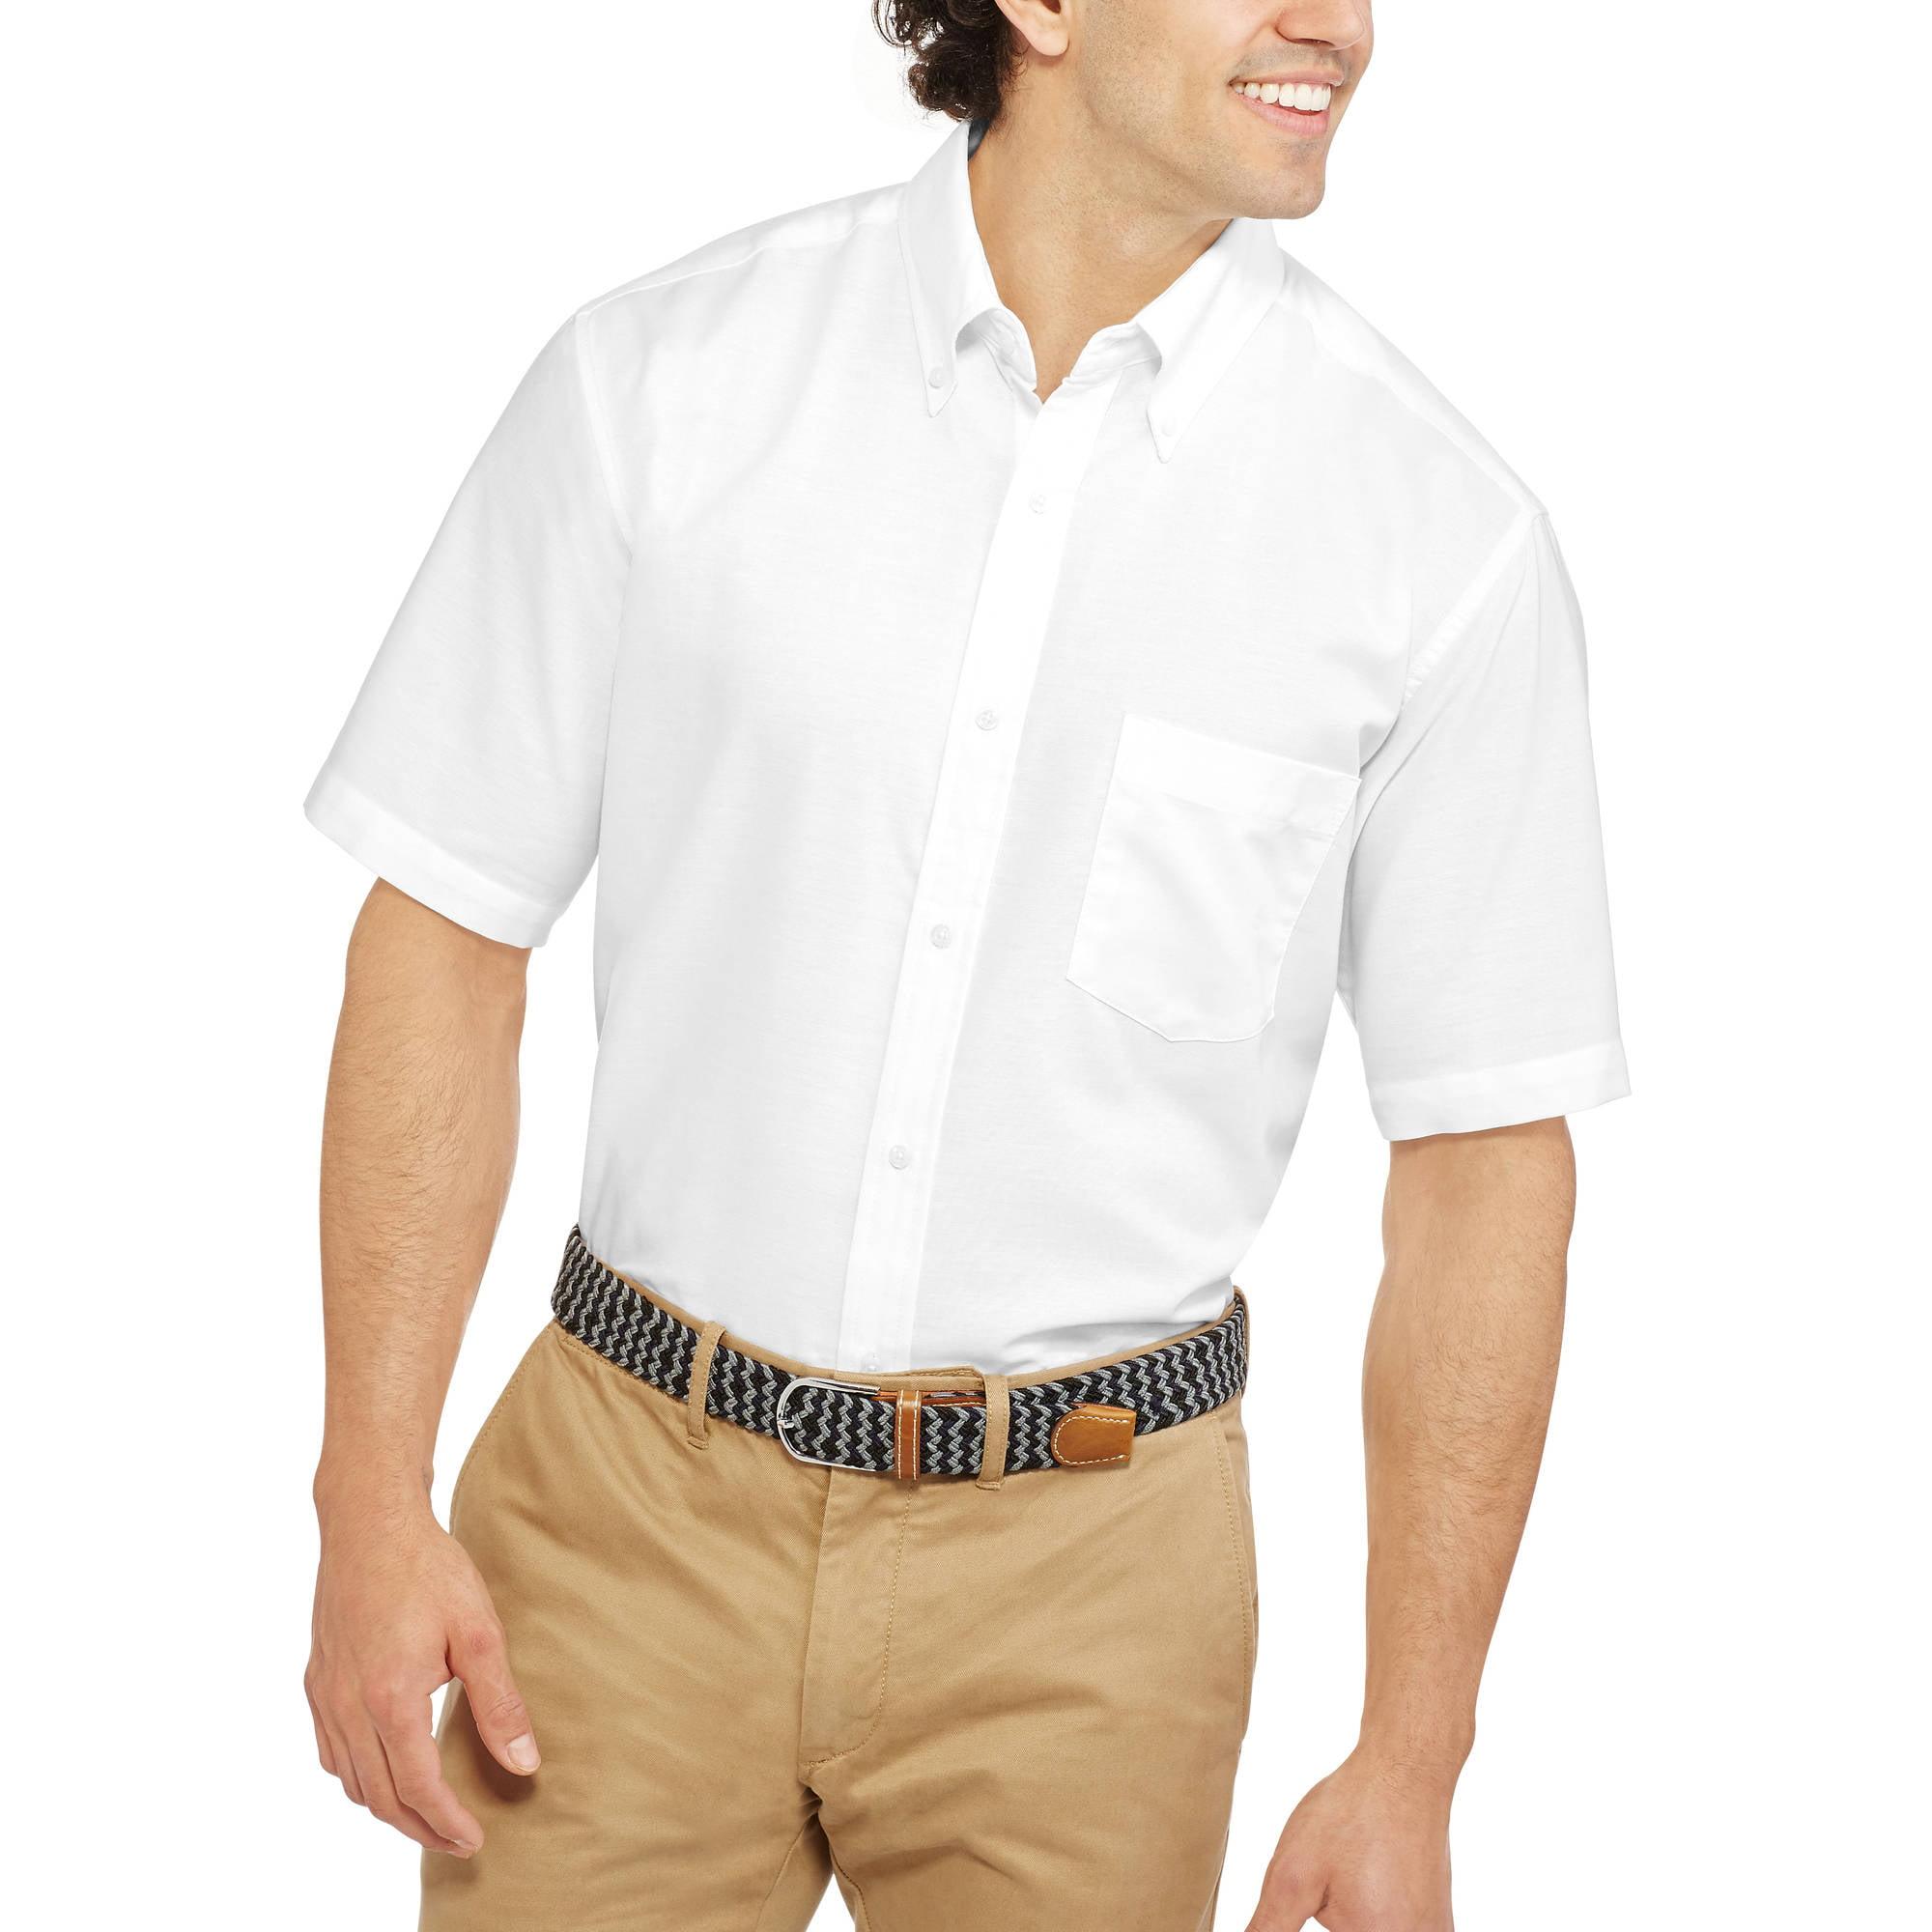 Womens Short Sleeve Shirts Walmart